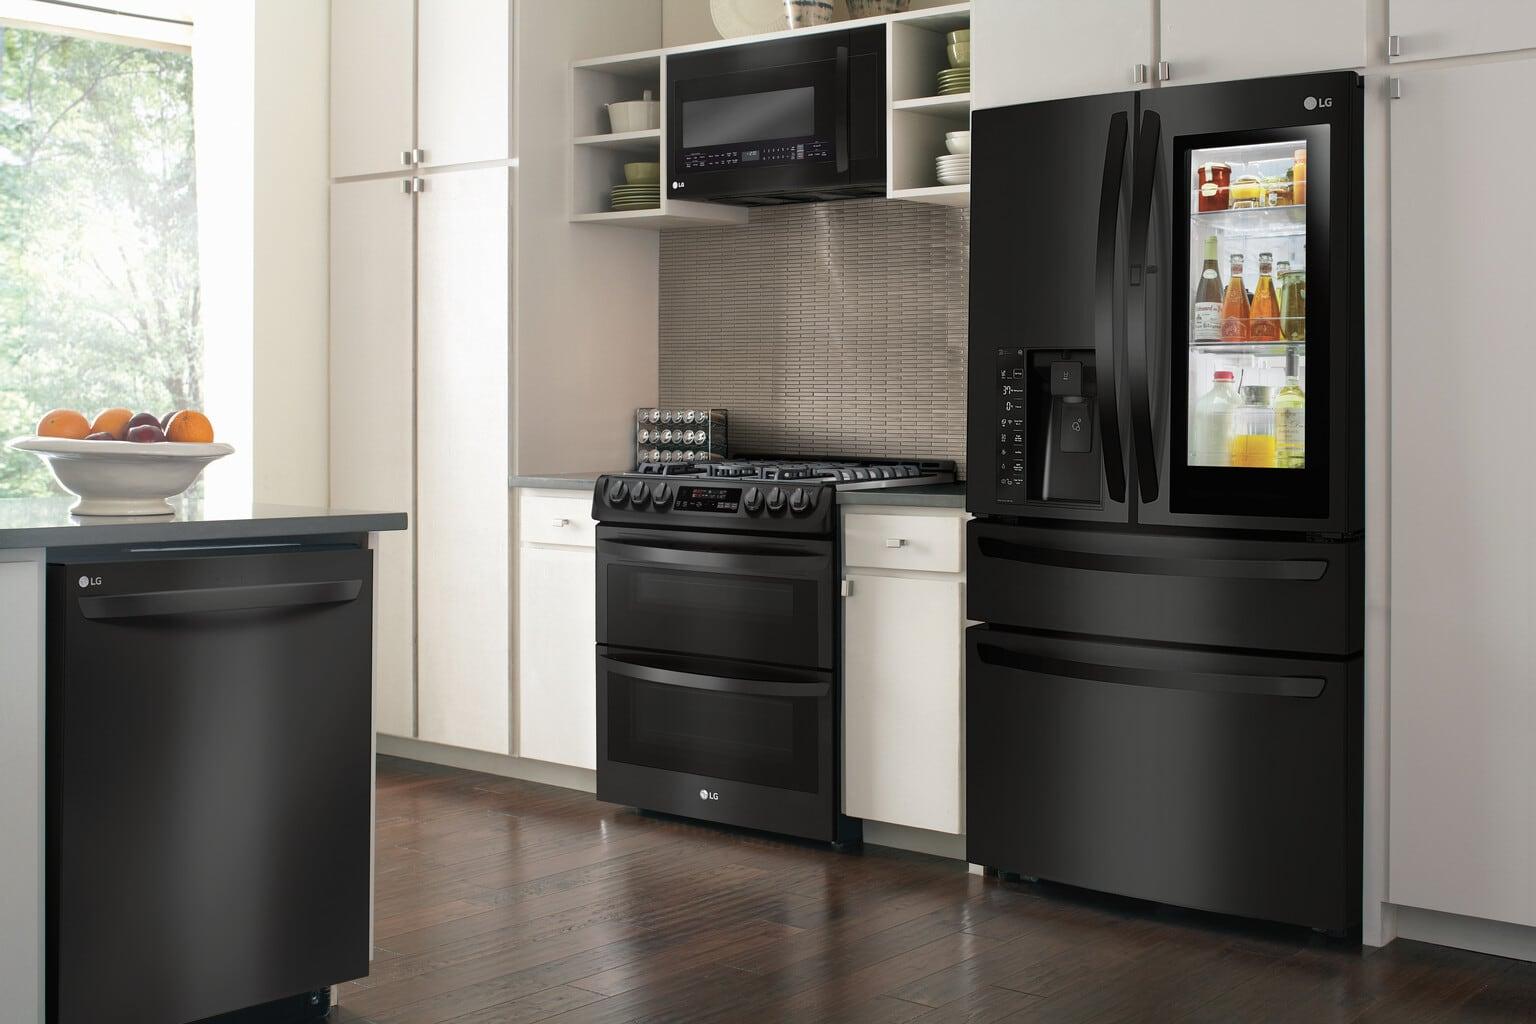 LG Matte Black Kitchen Appliances | Whisky + Sunshine